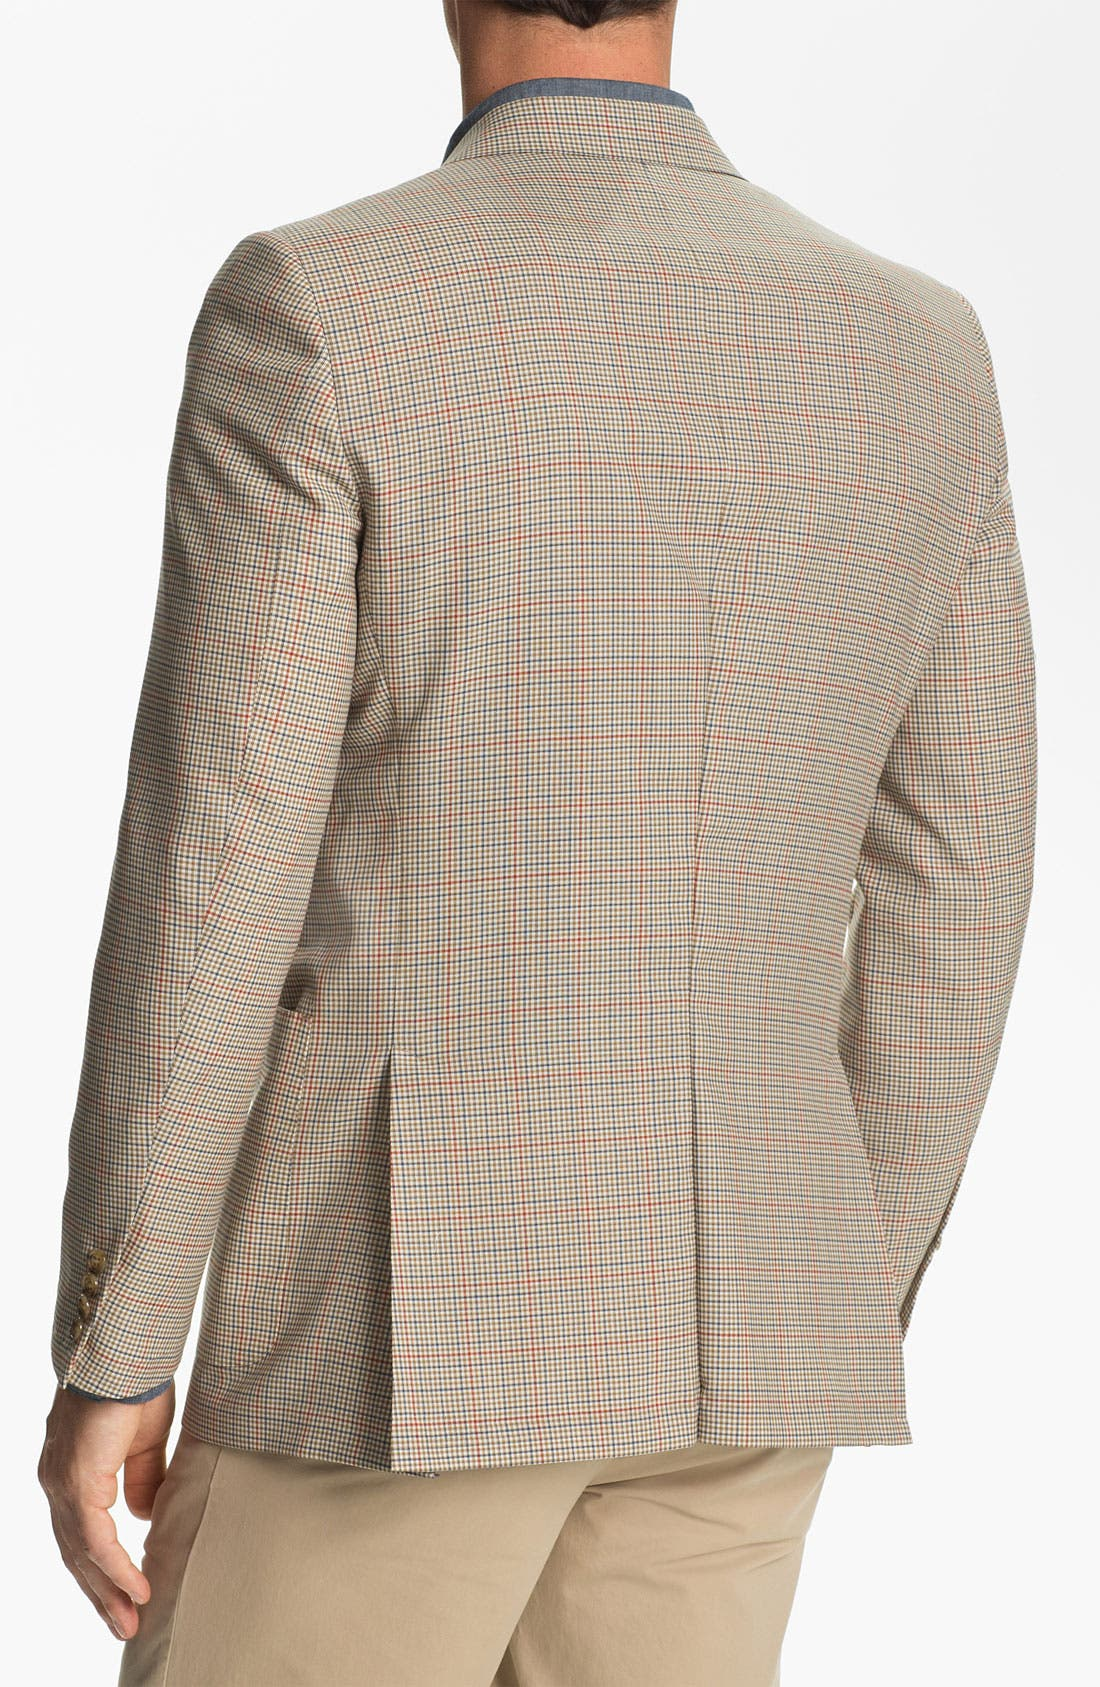 Alternate Image 2  - Hart Schaffner Marx Check Sportcoat